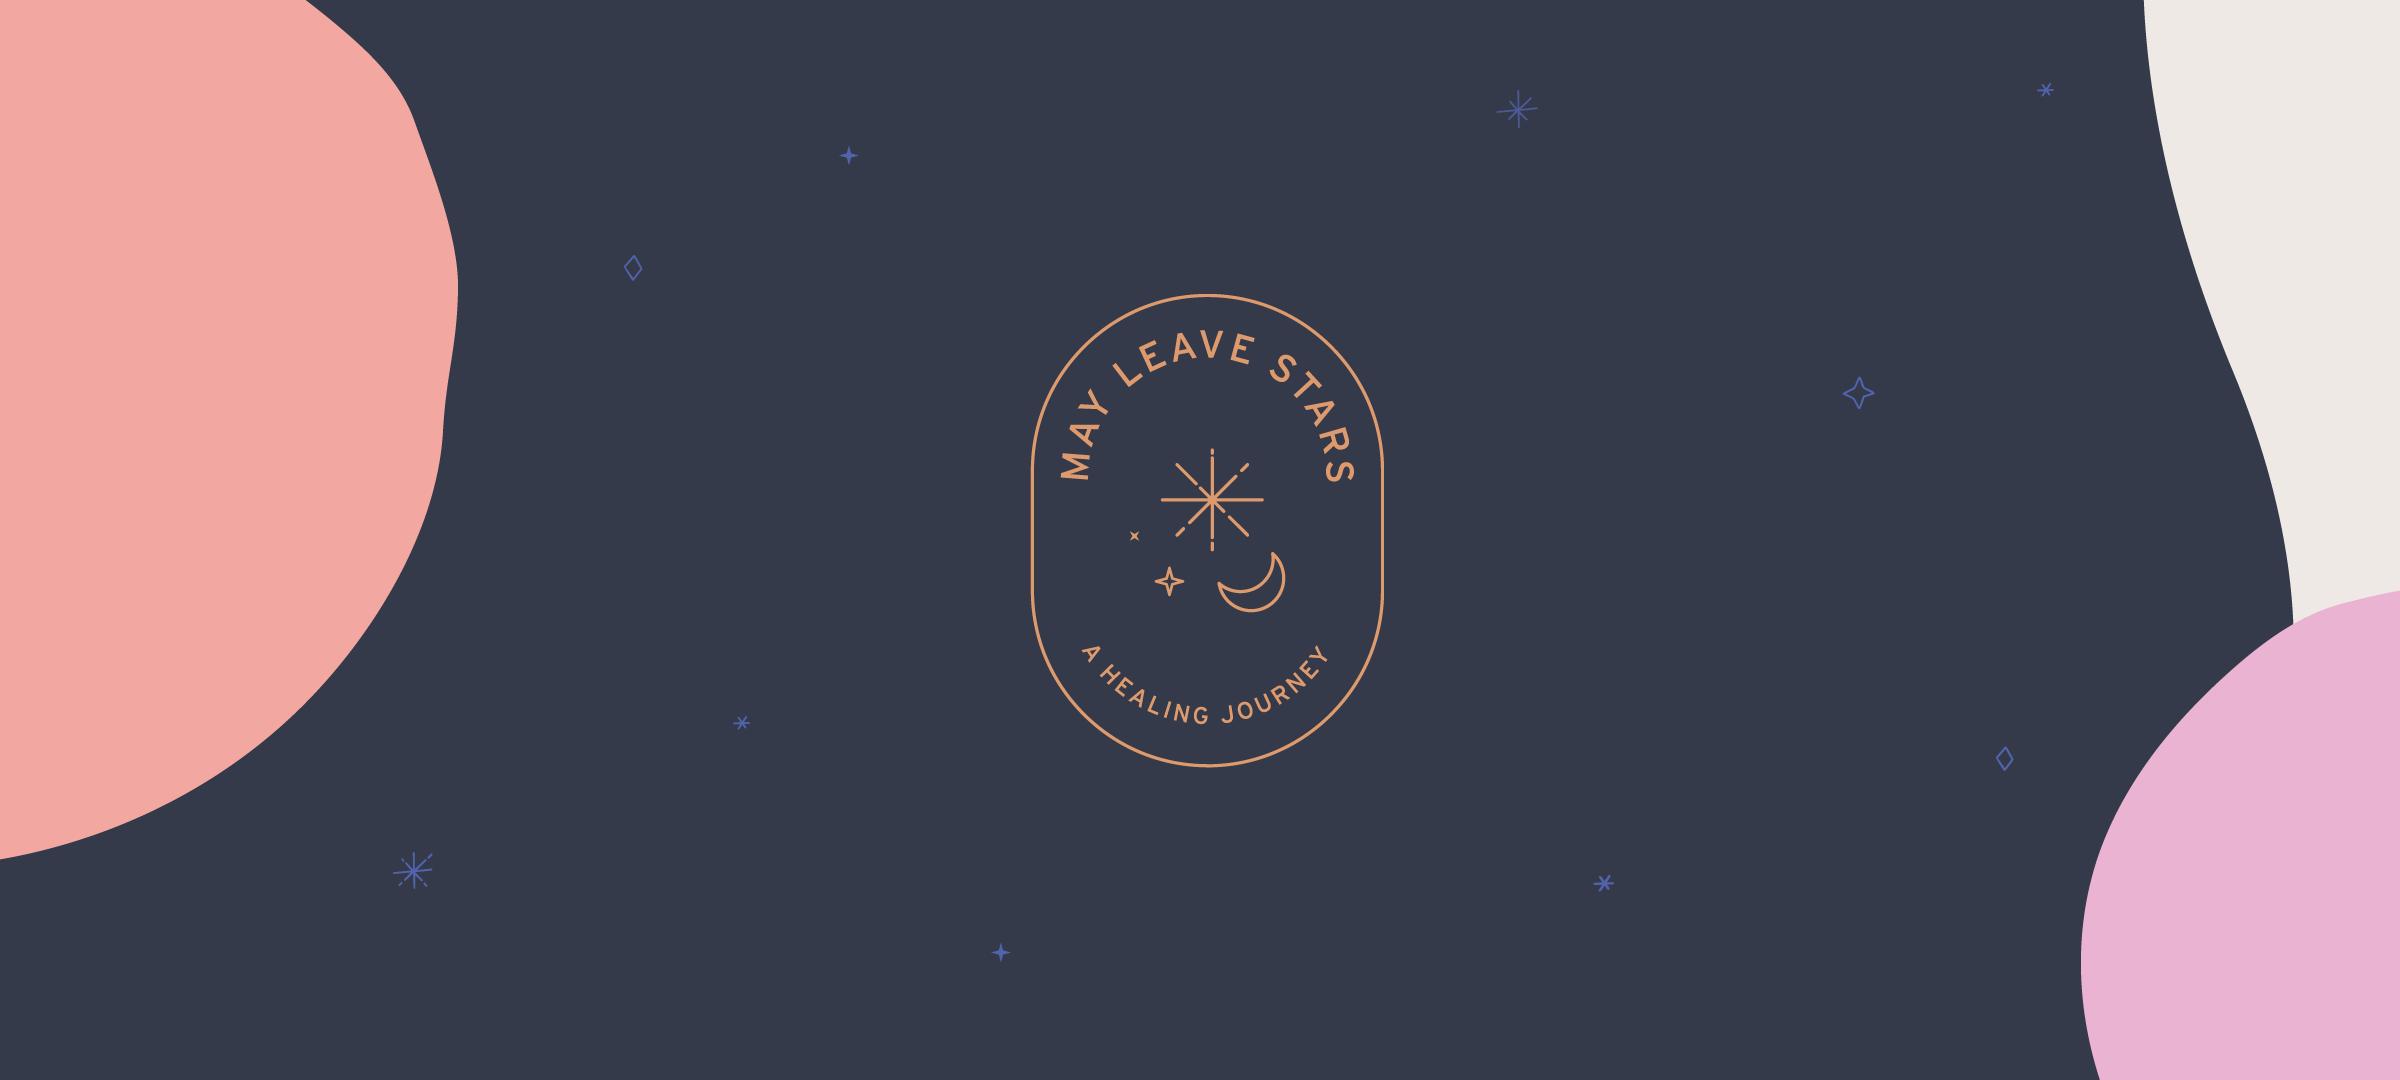 May Leaves Stars branding